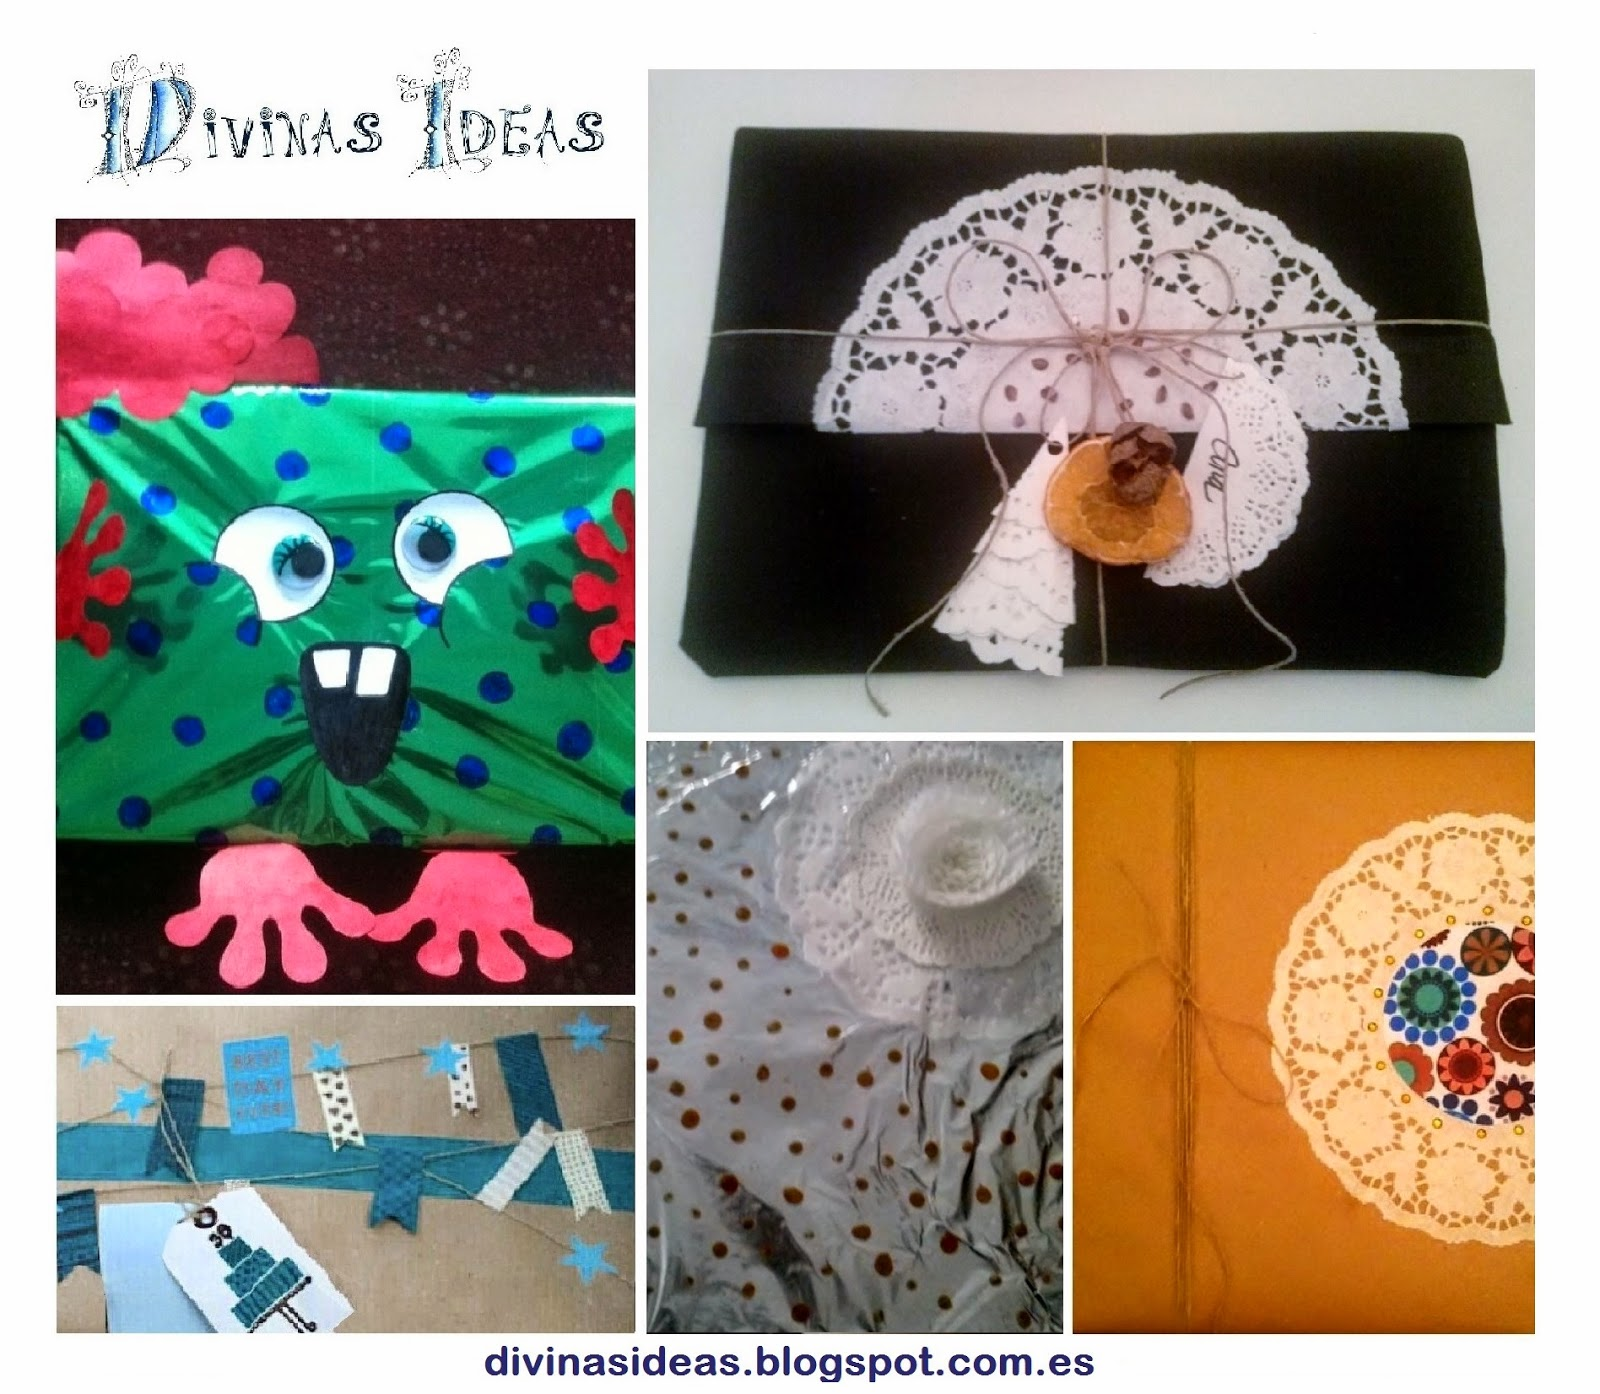 Divinas ideas paquetes para regalo decorados - Paquetes de regalo ...